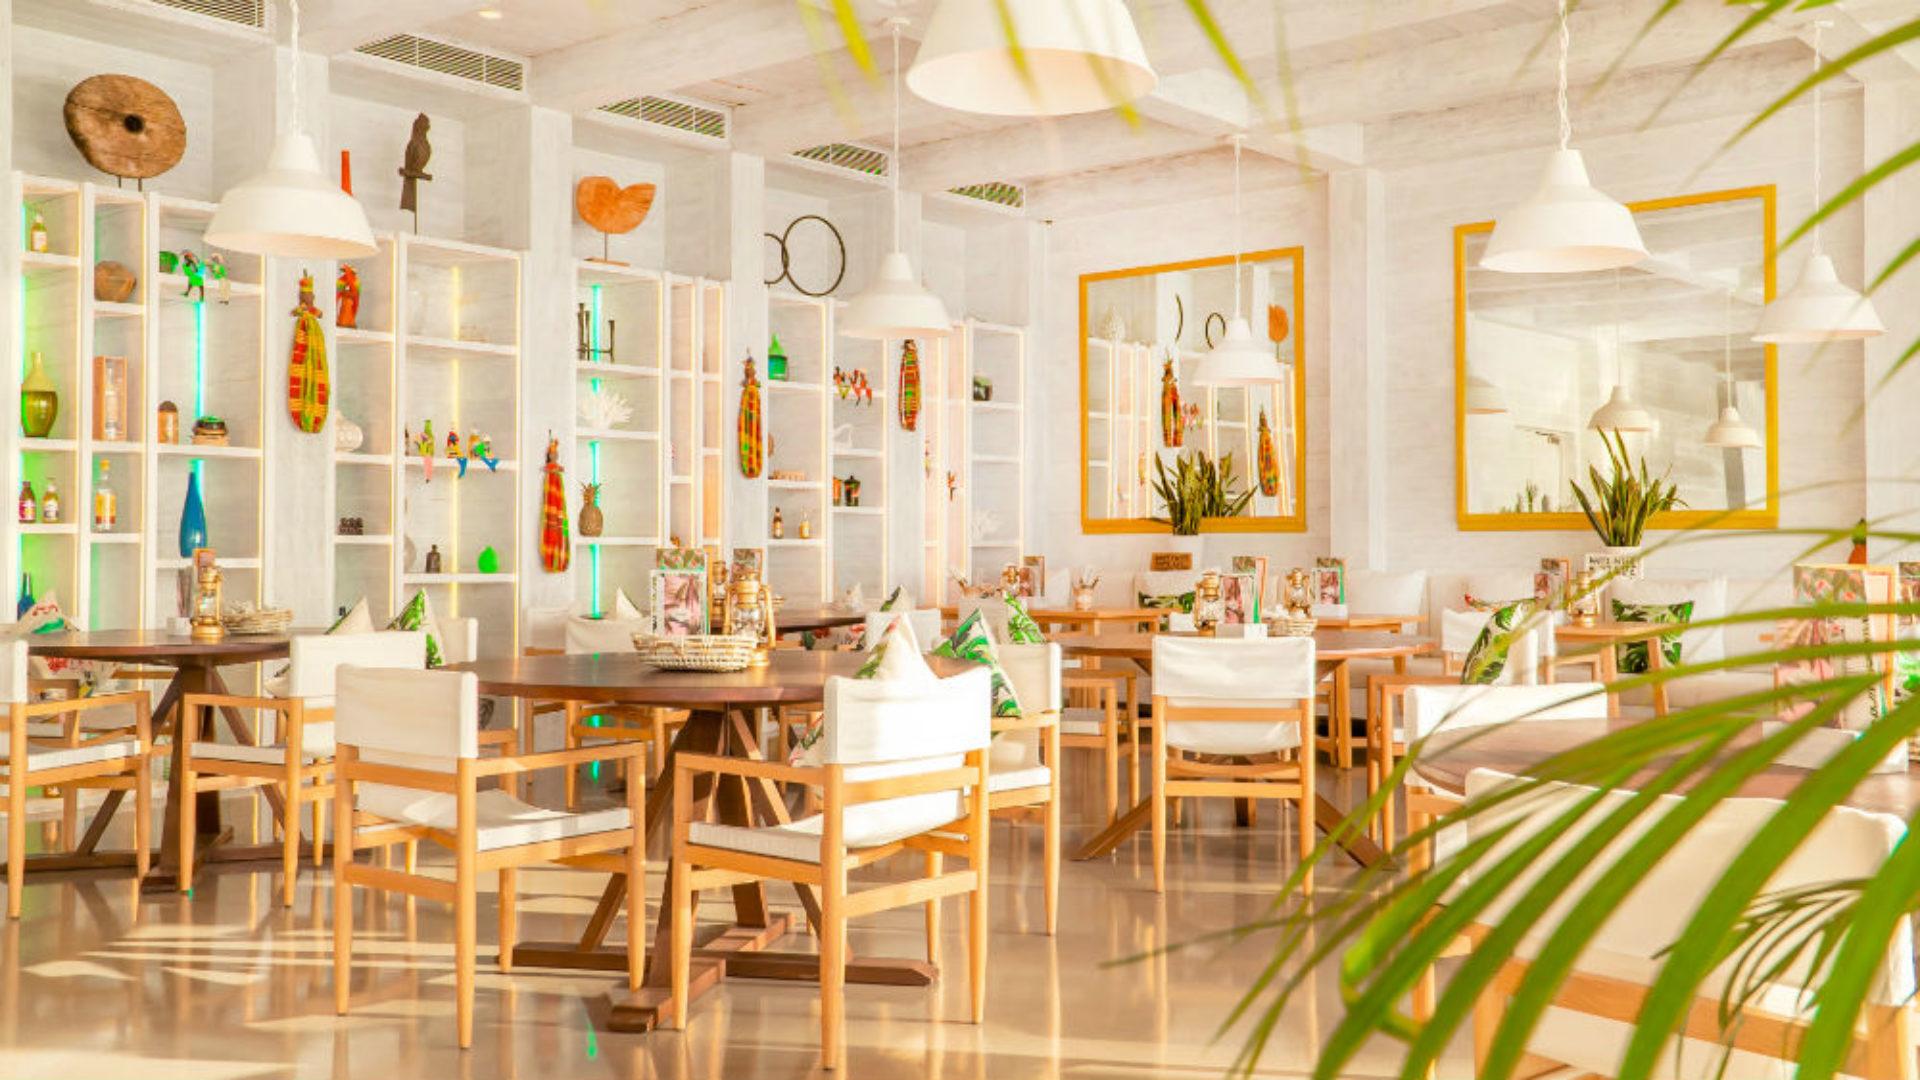 Interior of Key West Bar & Grill at Nikki Beach Resort & Spa